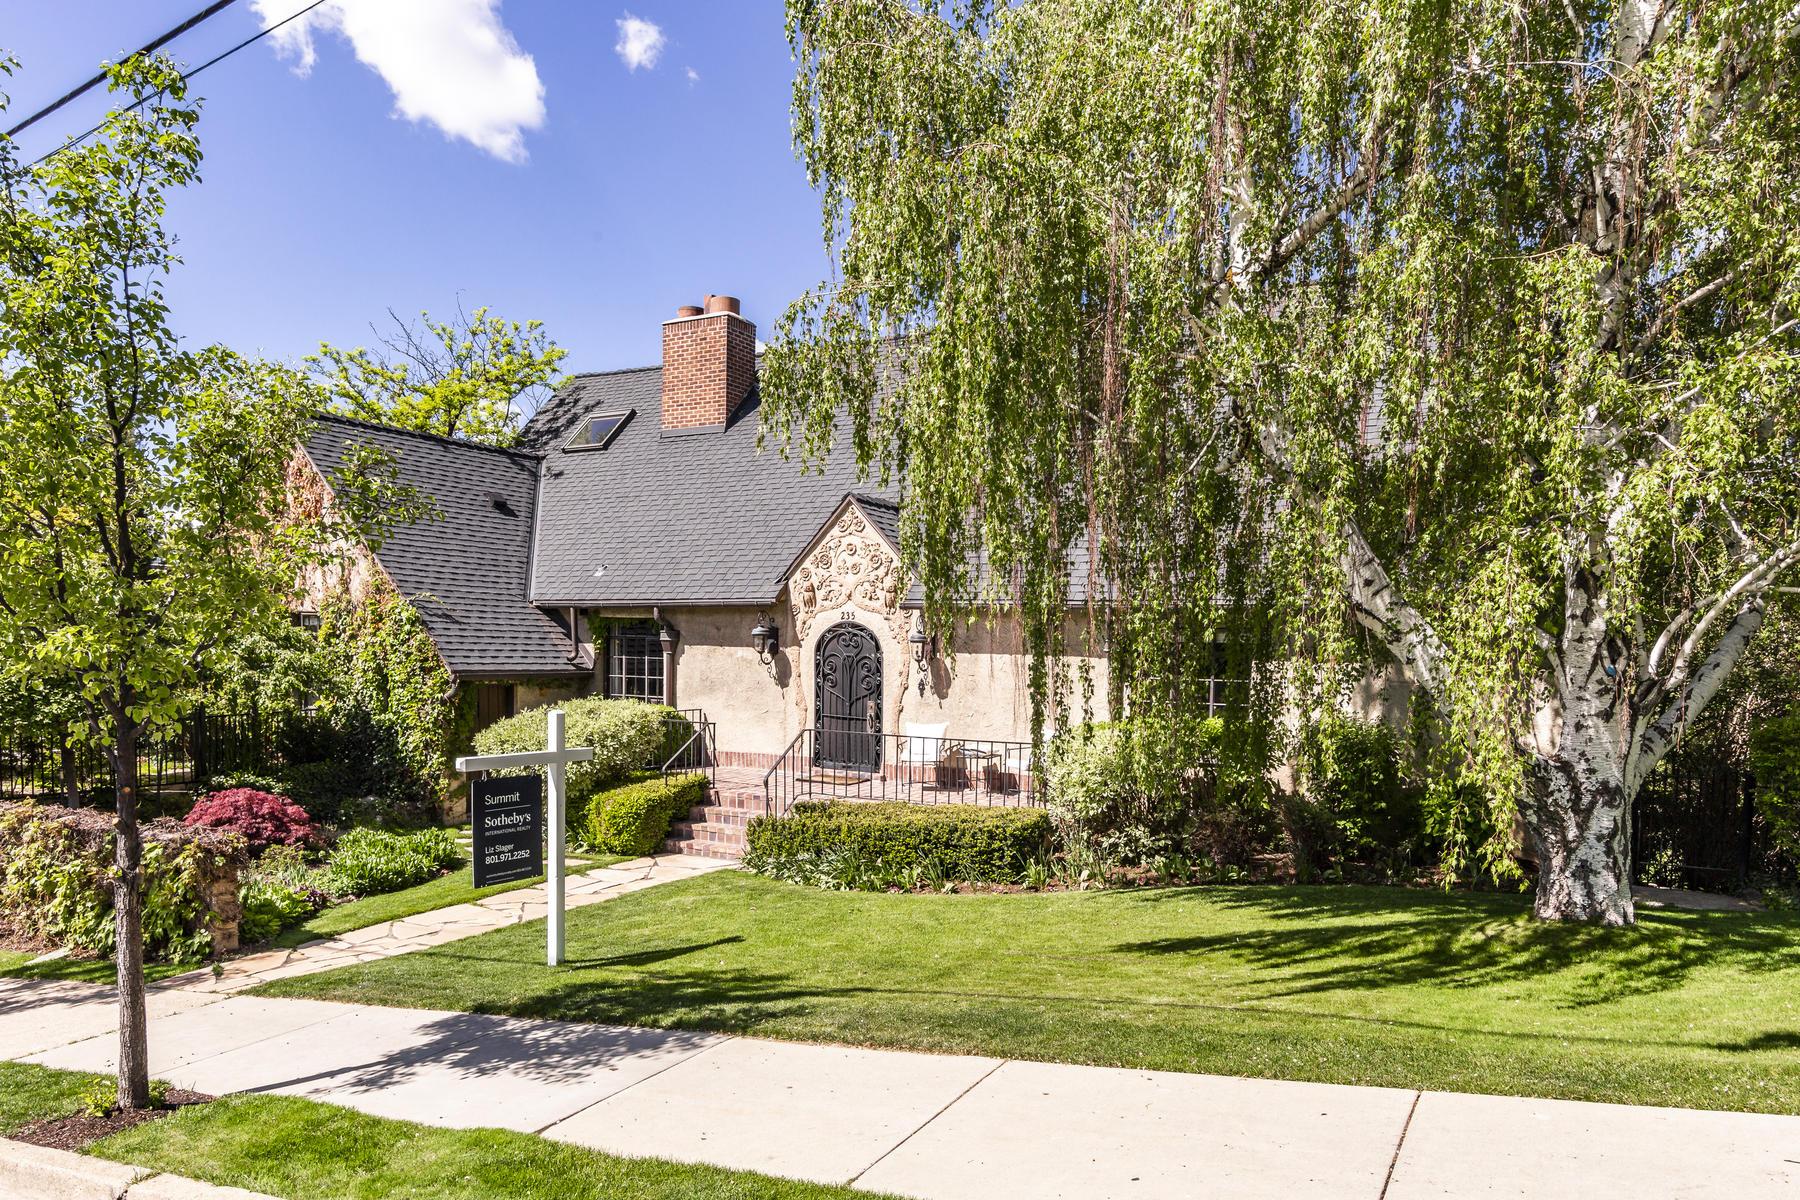 Single Family Homes for Sale at Georgius Cannon Timeless Tudor Estate 235 A Street Salt Lake City, Utah 84103 United States